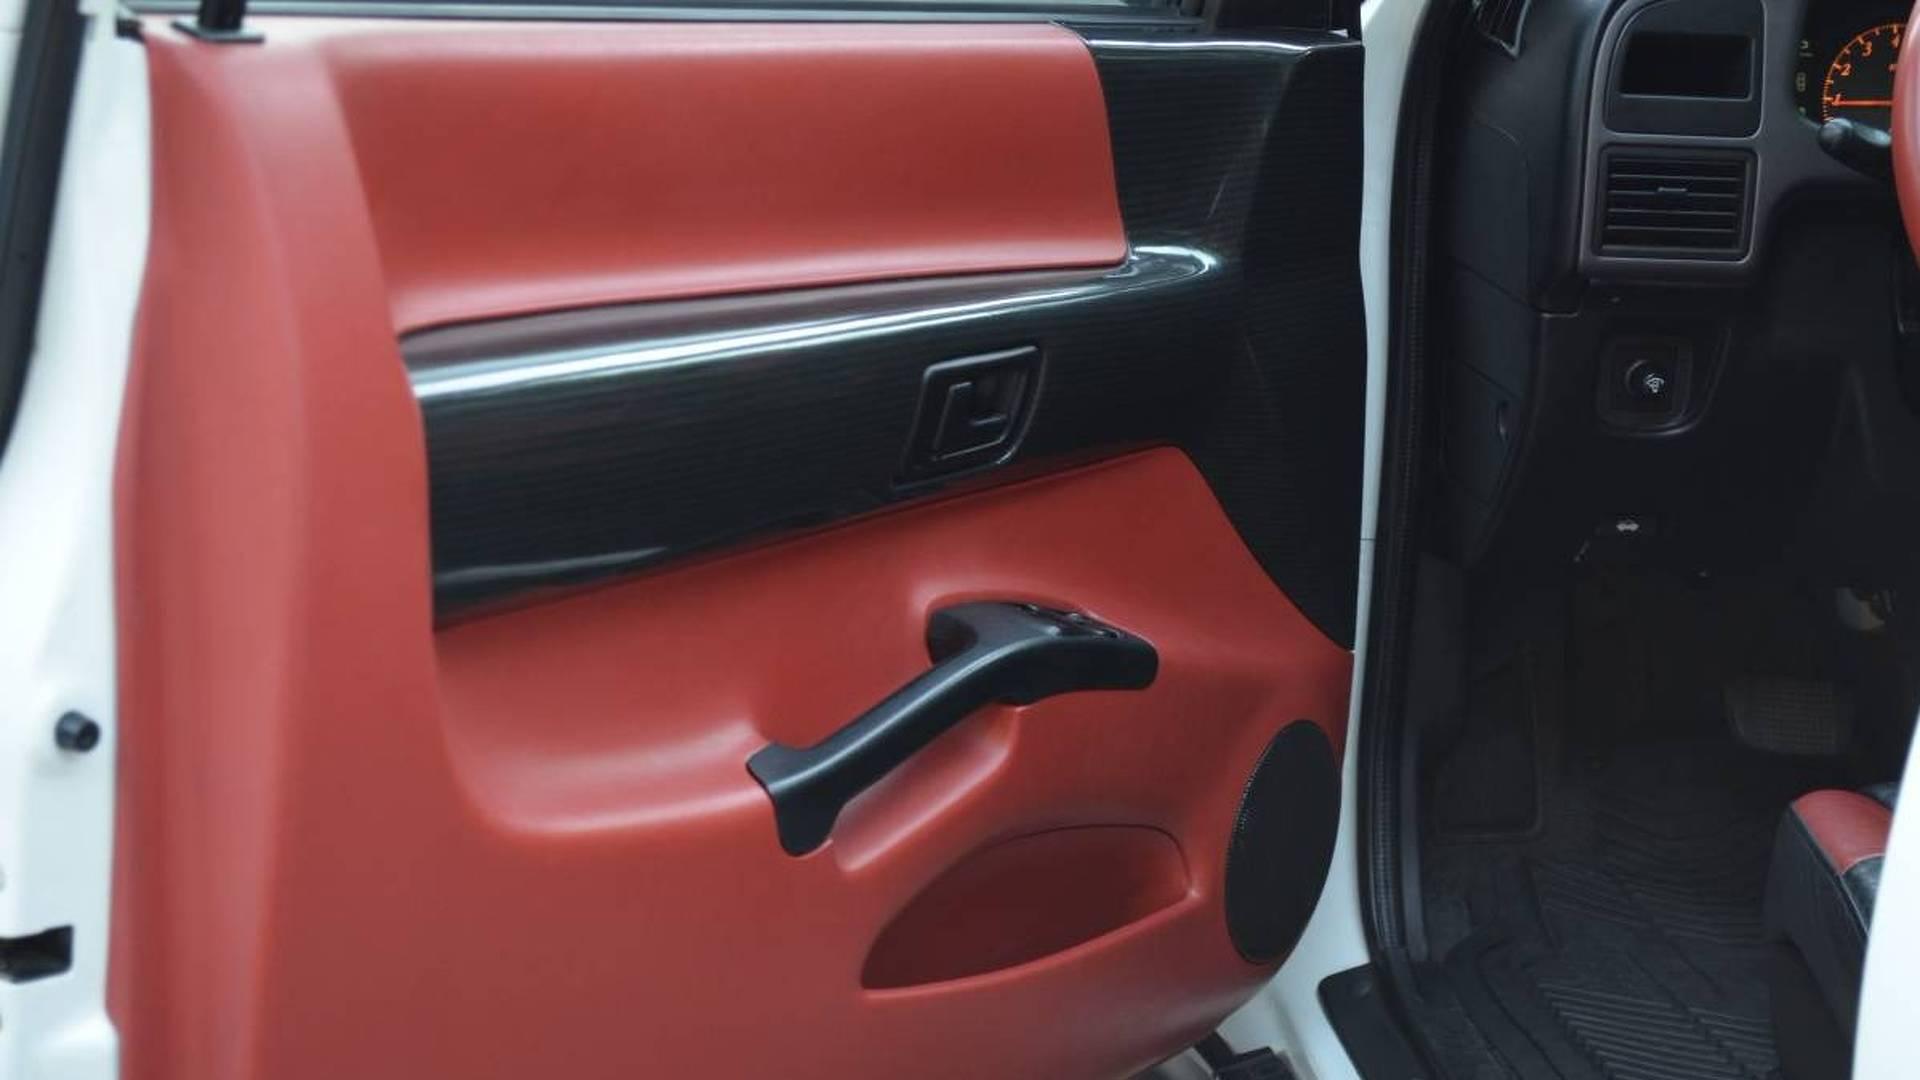 2001-isuzu-vehicross-ironman-edition-for-sale (10)